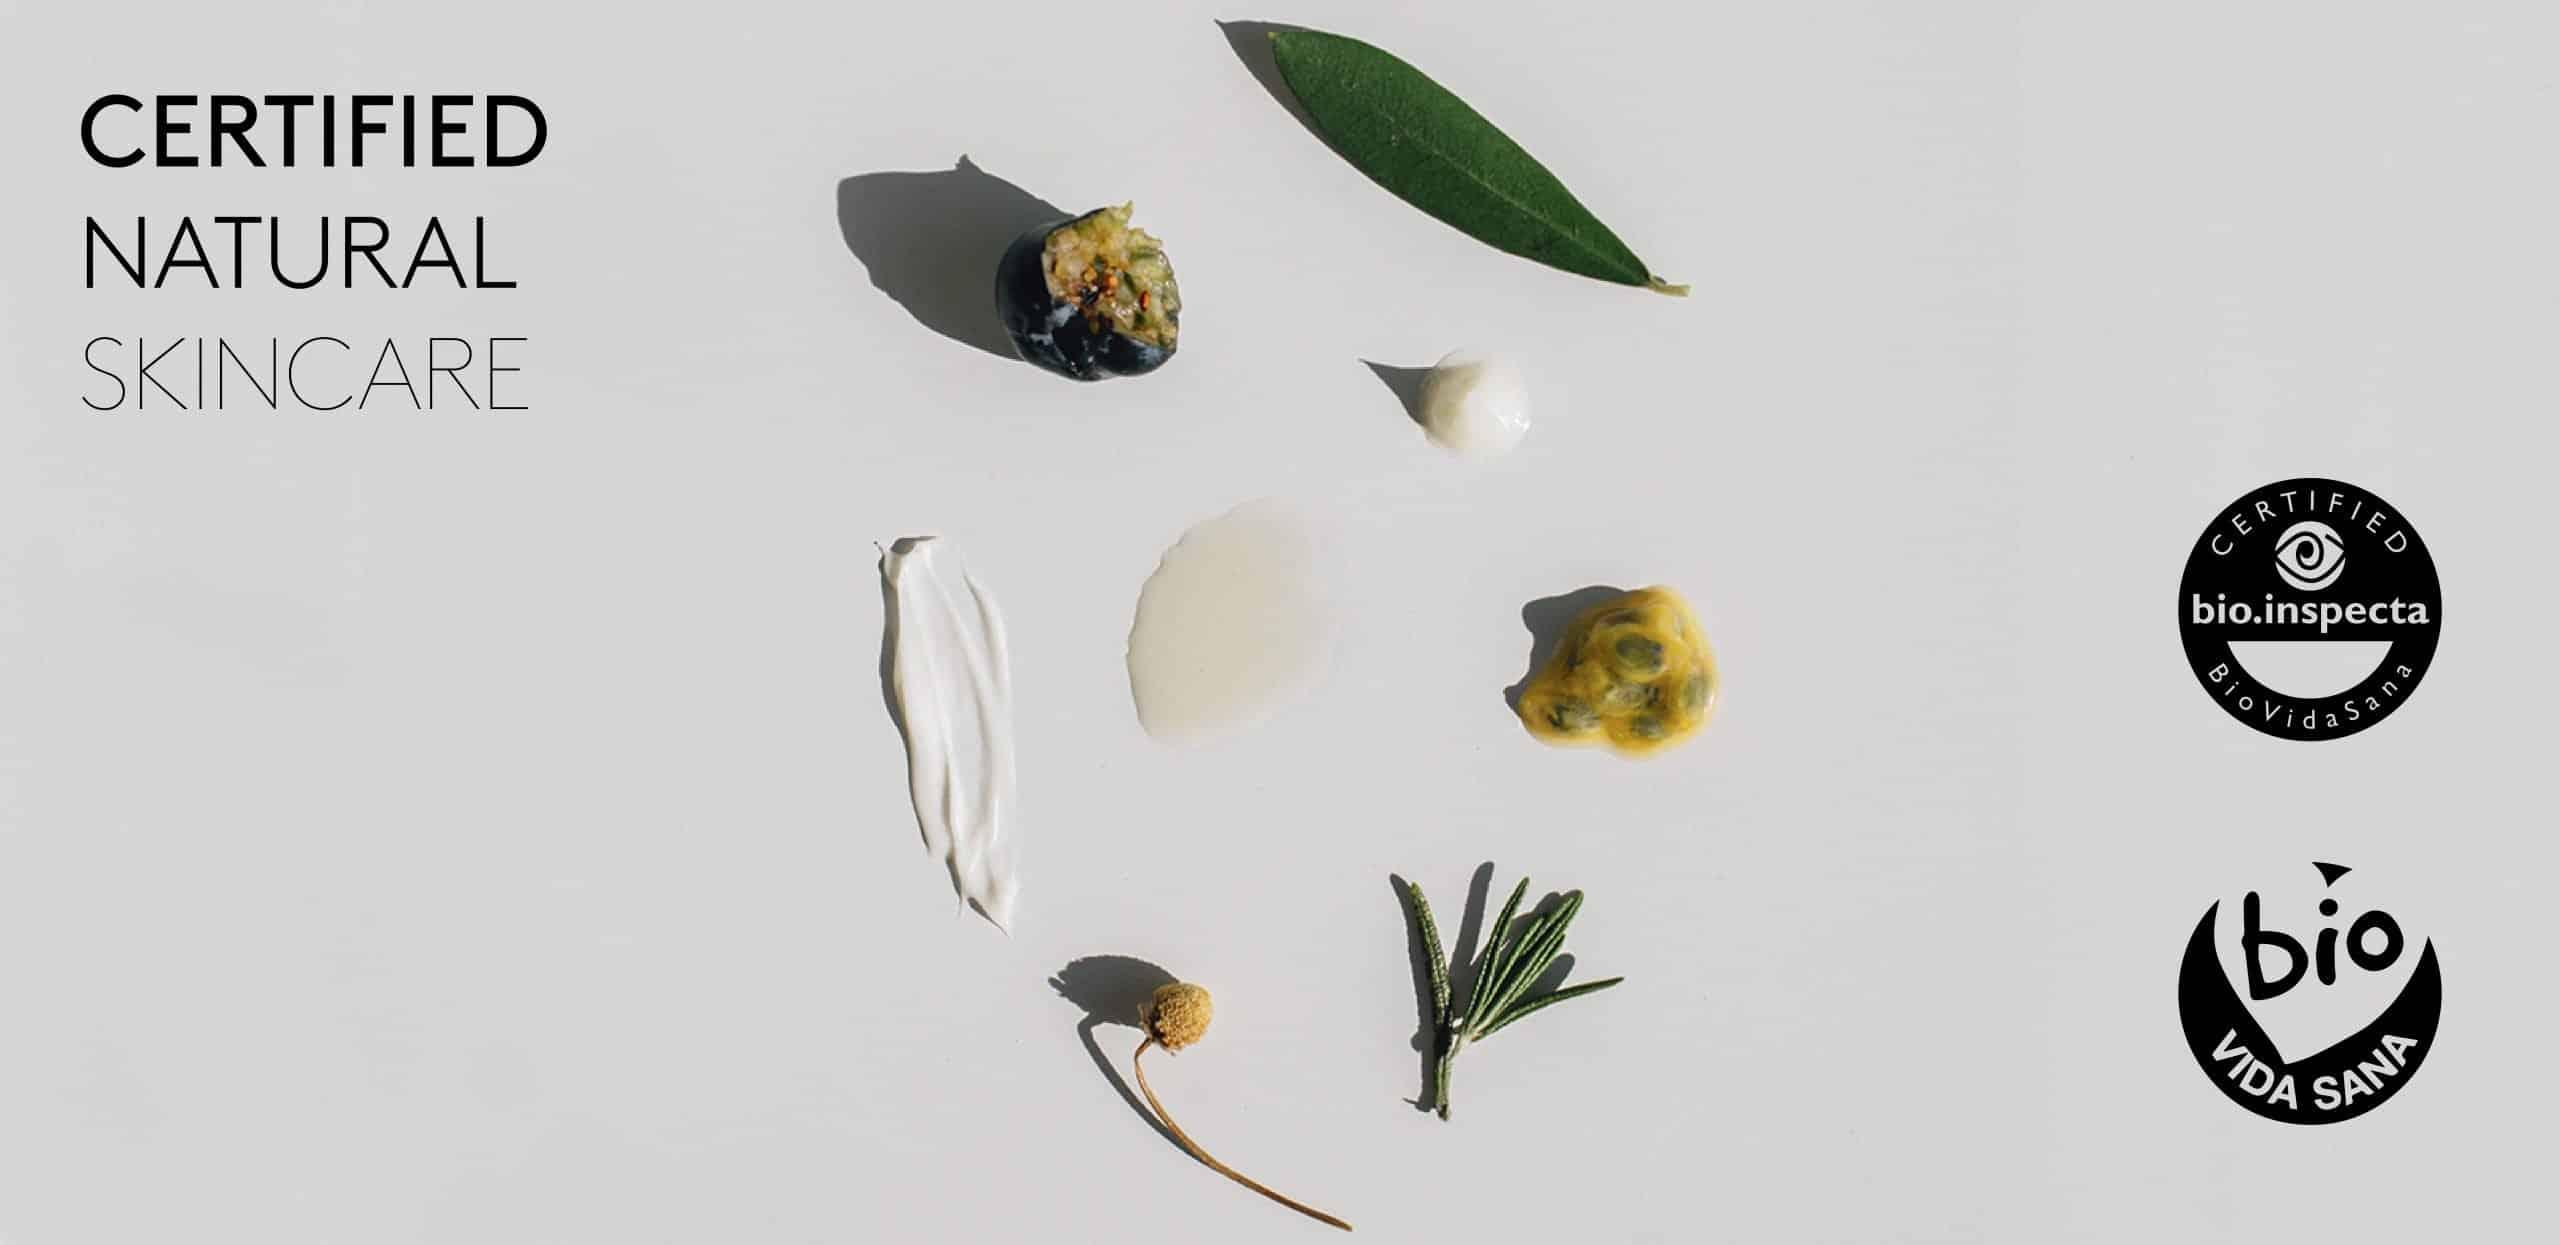 cosmetica natural certificada bioinspecta Lamixtura